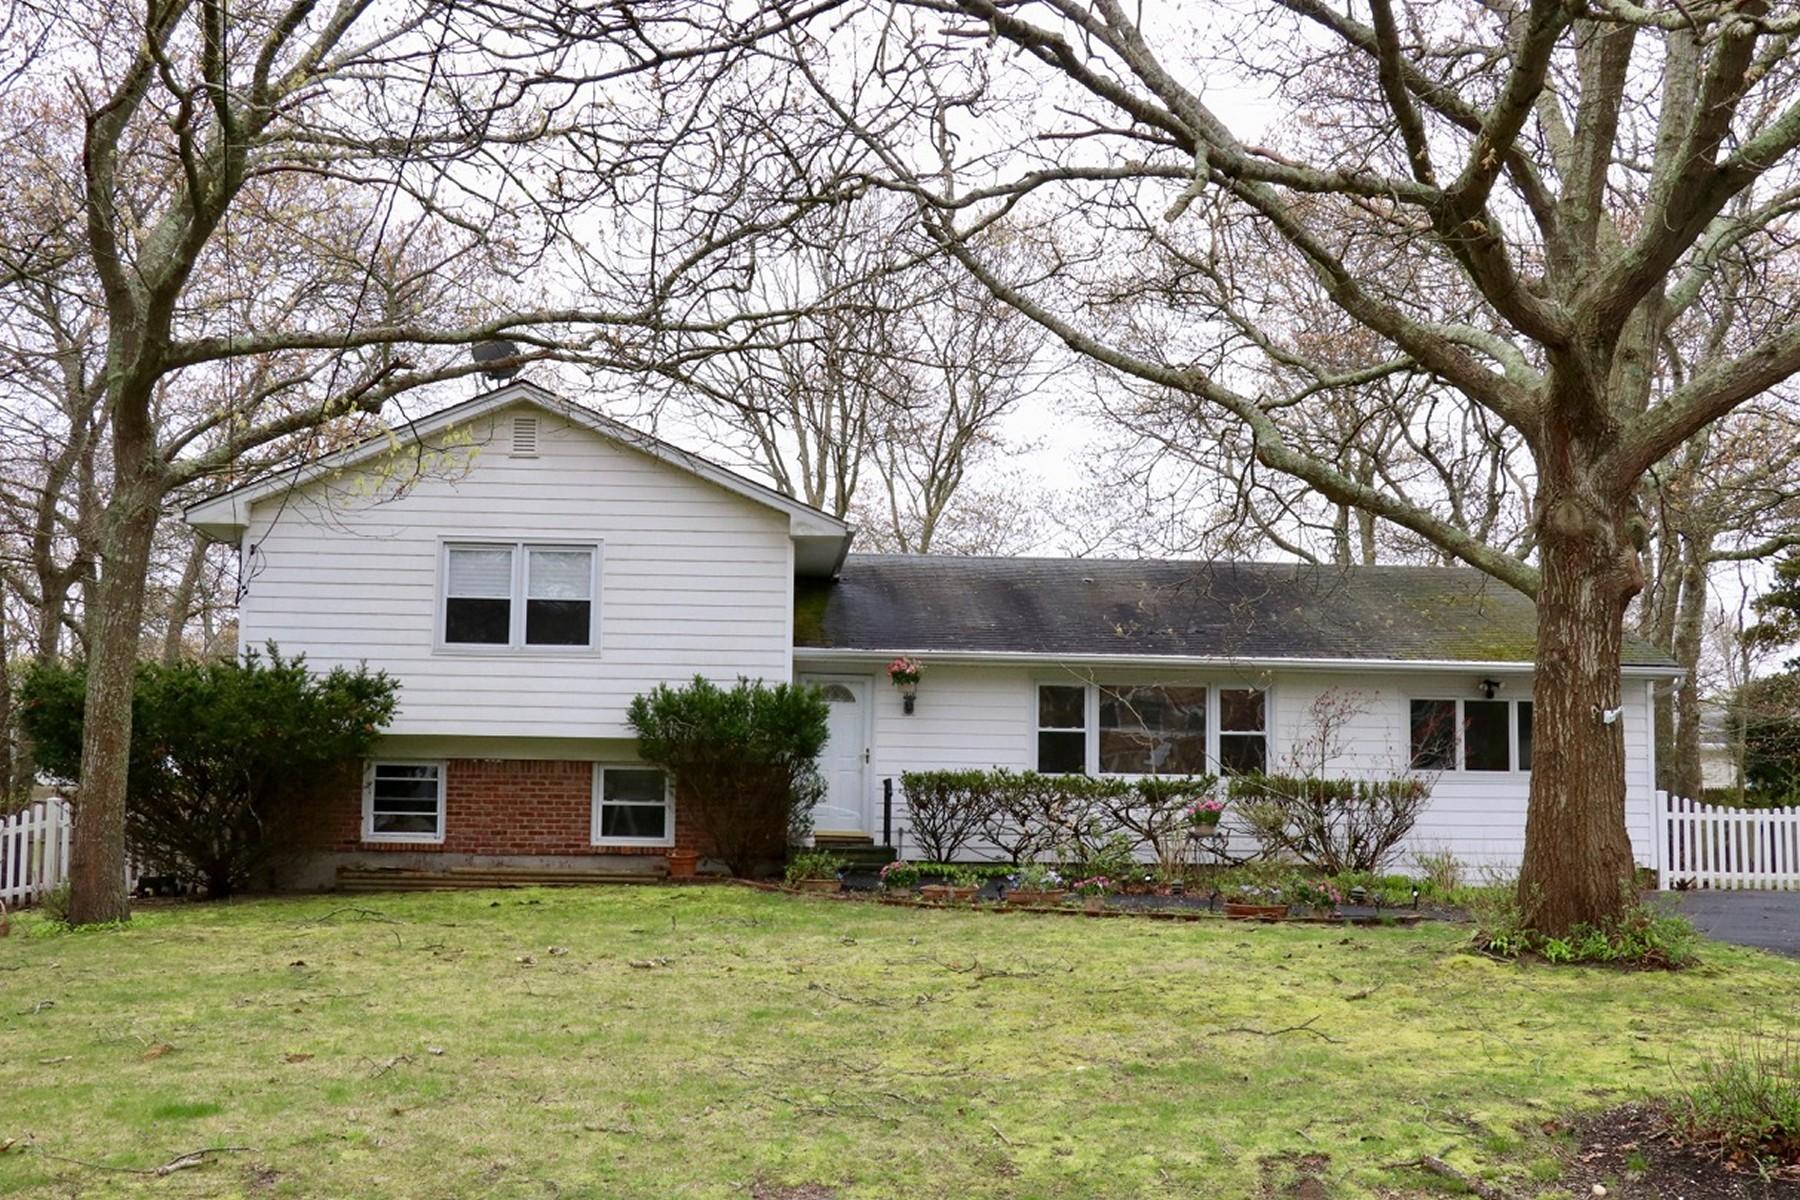 Single Family Home for Active at Hampton Bays 32 Lovell Rd Hampton Bays, New York 11946 United States